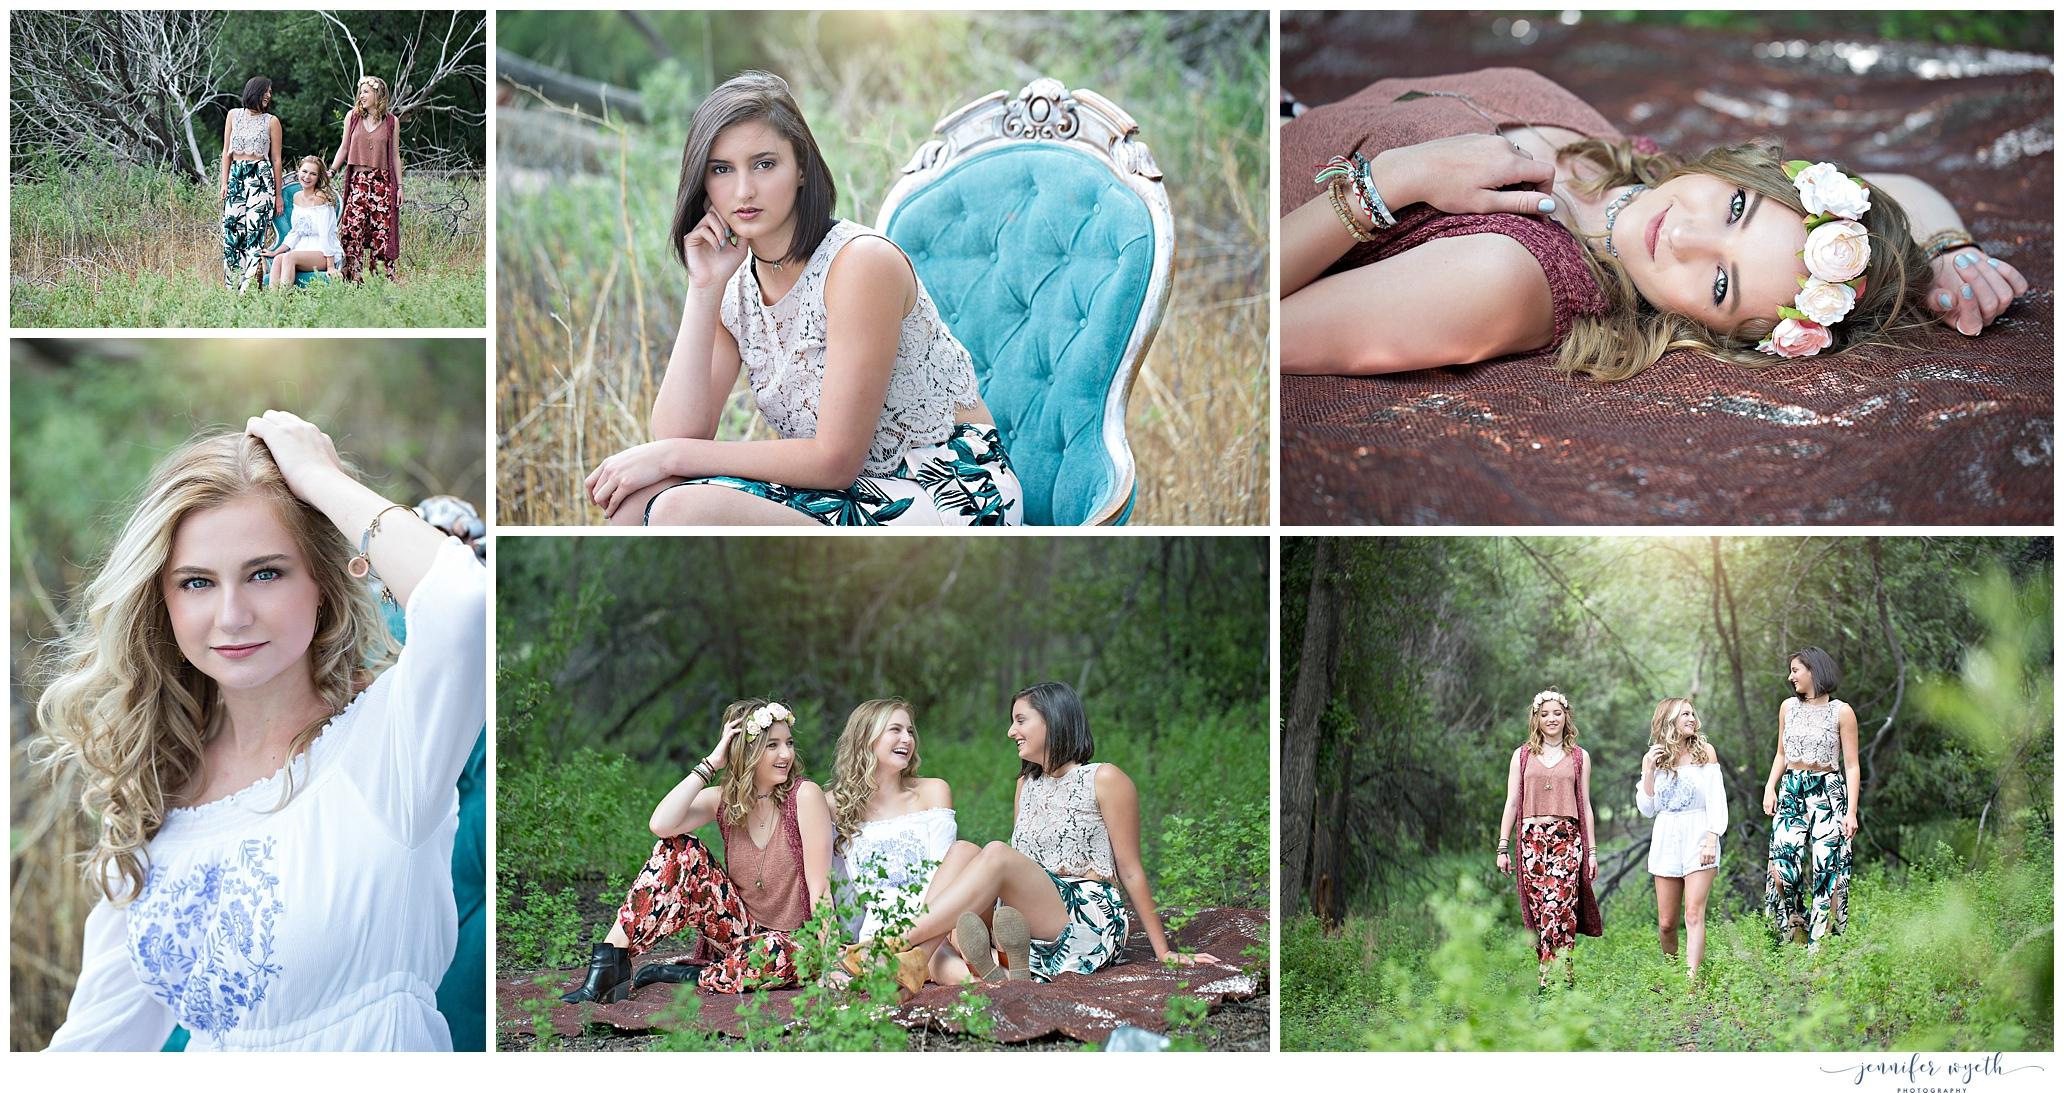 Jennifer-Wyeth-photography-senior-pictures-colorado-springs-photographer_0229.jpg